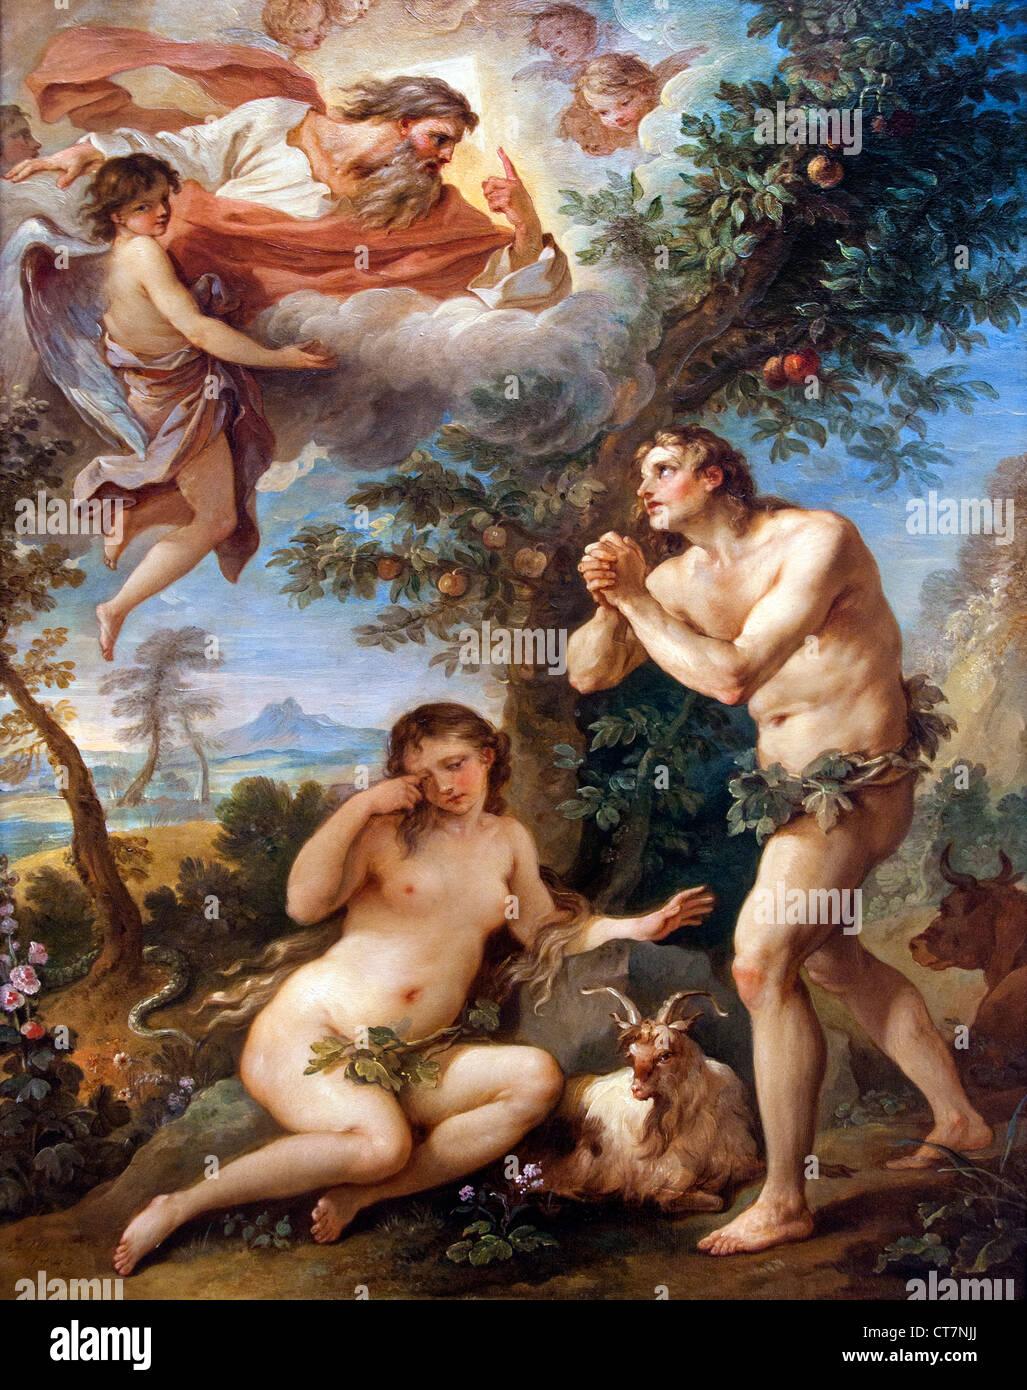 The Expulsion from Paradise 1740 Charles Joseph Natoire French France - Stock Image